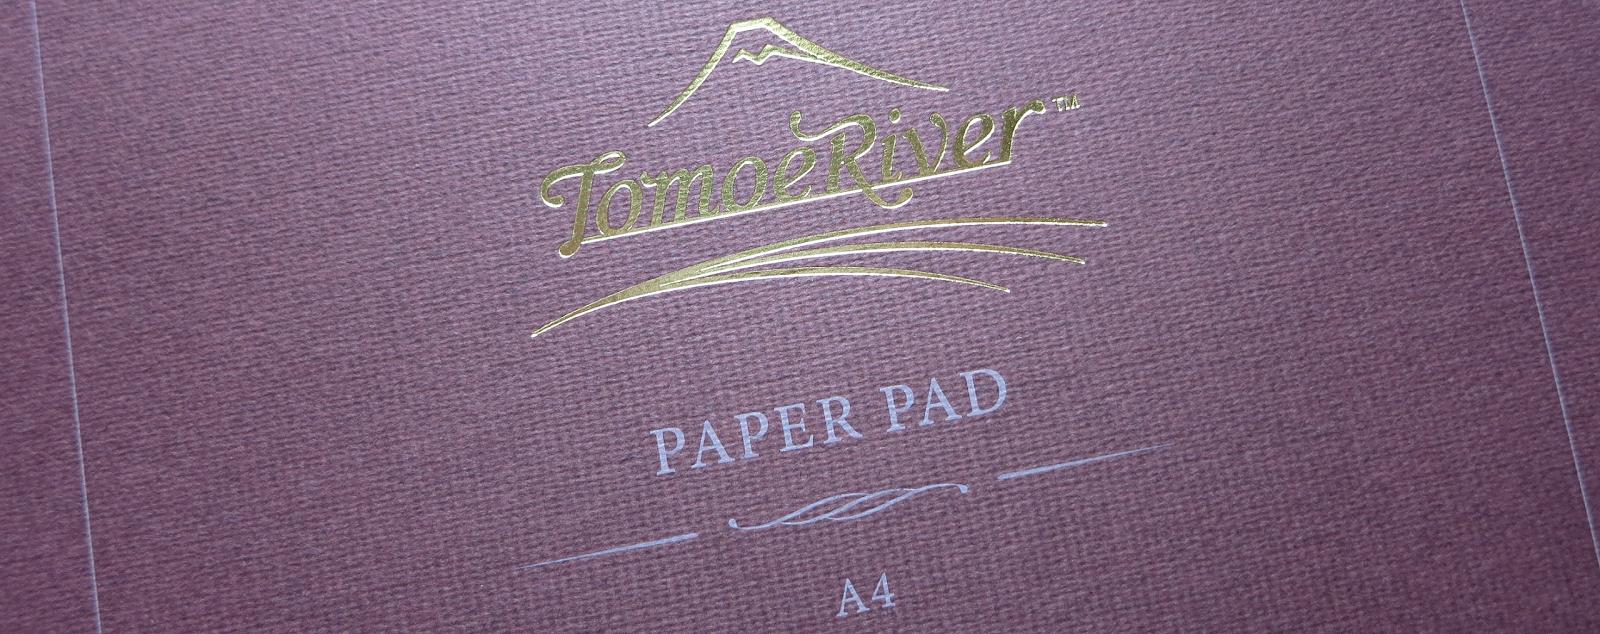 River ran out eden essay